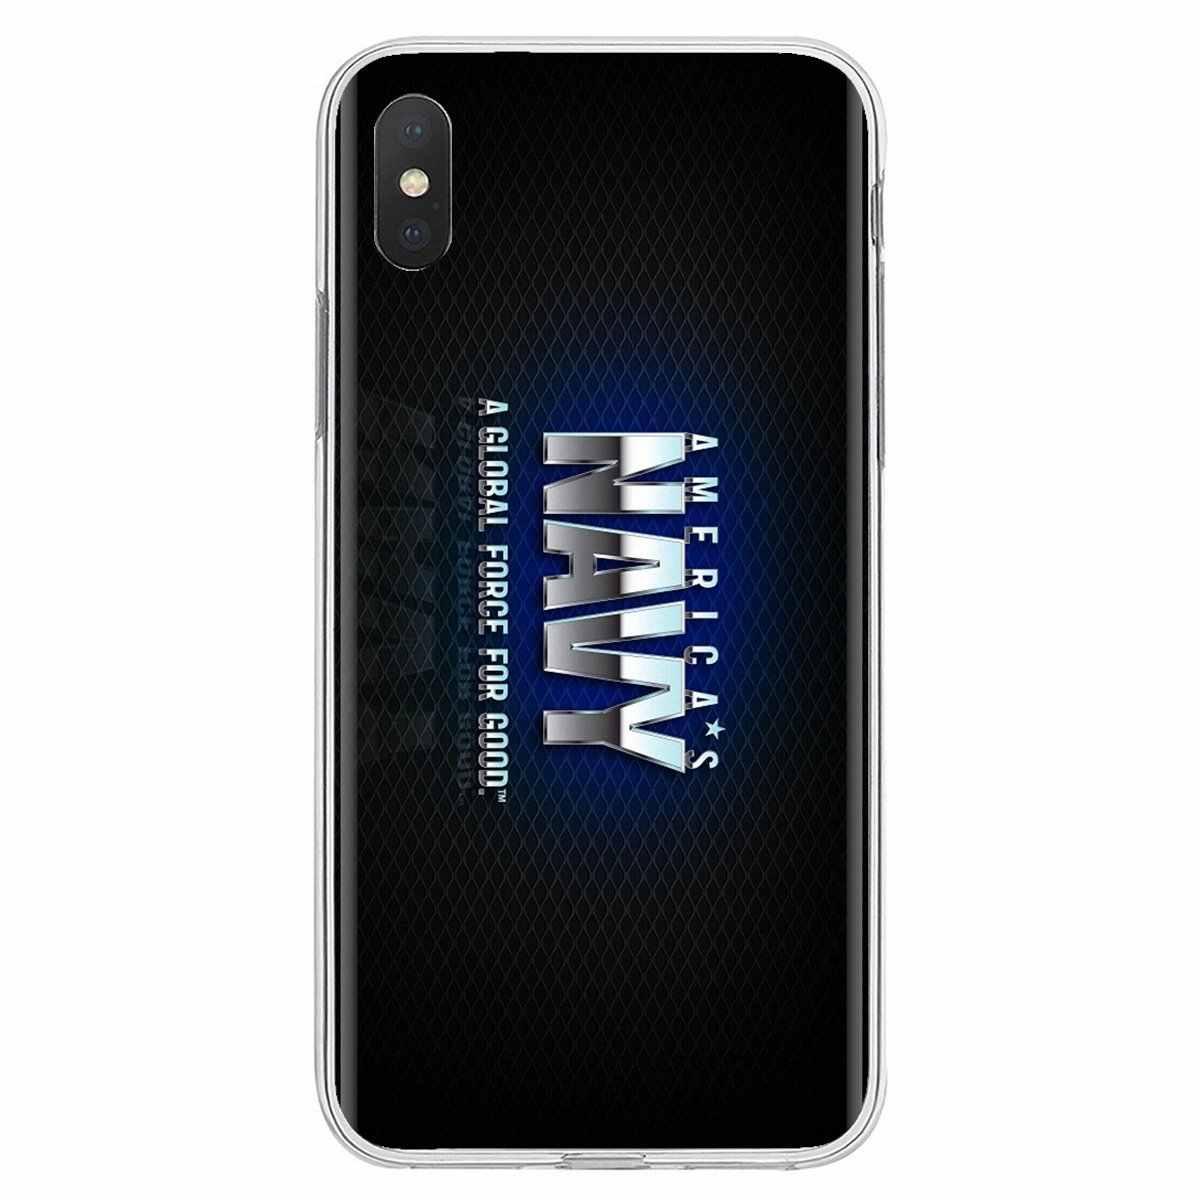 Usnavy 인감 팀 로고 포스터 for iphone 11 pro 4 4 s 5 5 s se 5c 6 6 s 7 8 x xr xs plus max for ipod touch 소프트 실리콘 tpu 케이스